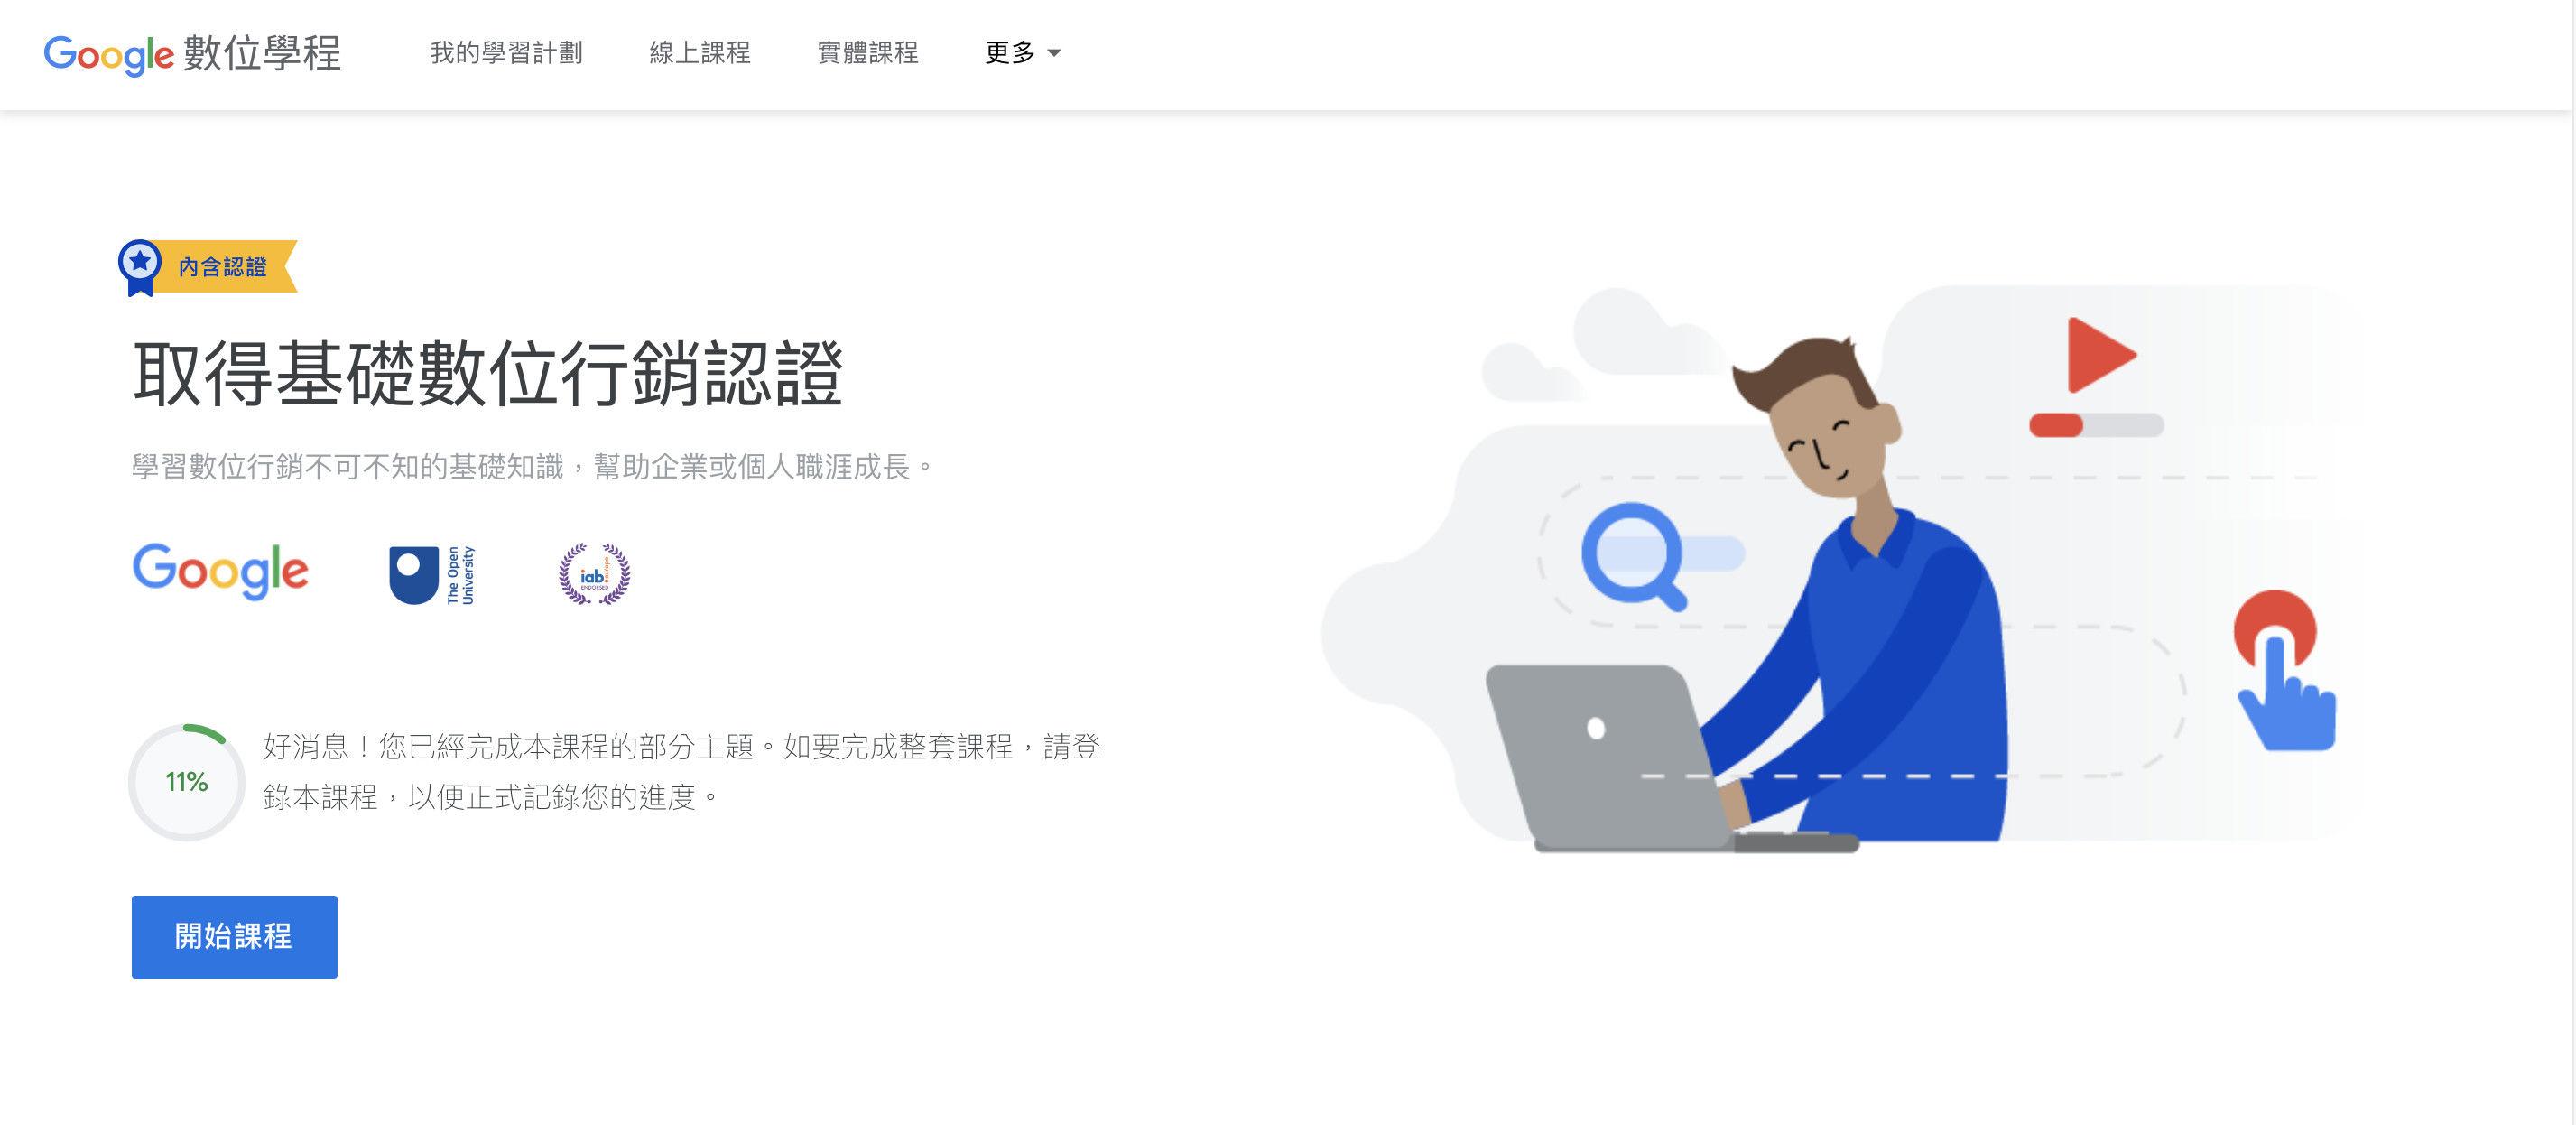 Google數位學程取得基礎認證-鯊客科技SEO網頁設計公司